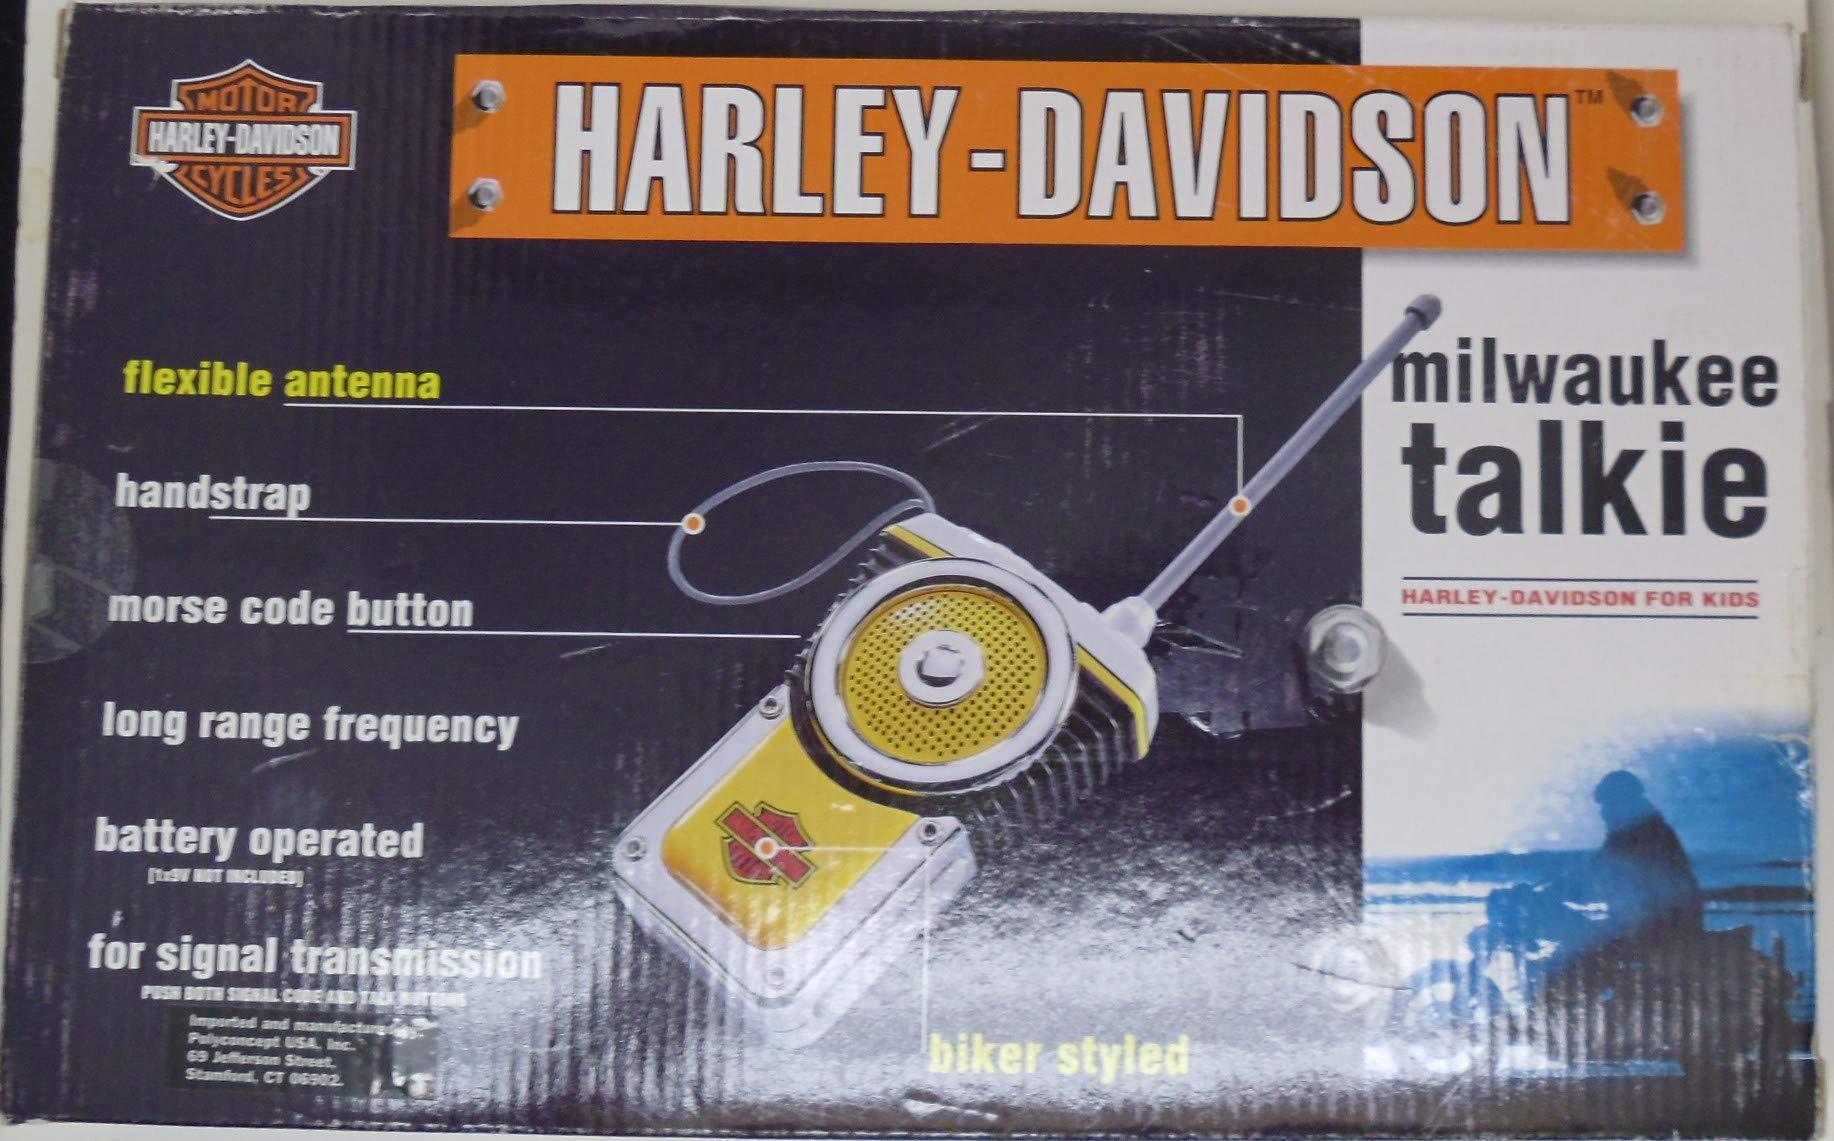 Harley-Davidson Milwaukee Talkie by Harley-Davidson (Image #2)